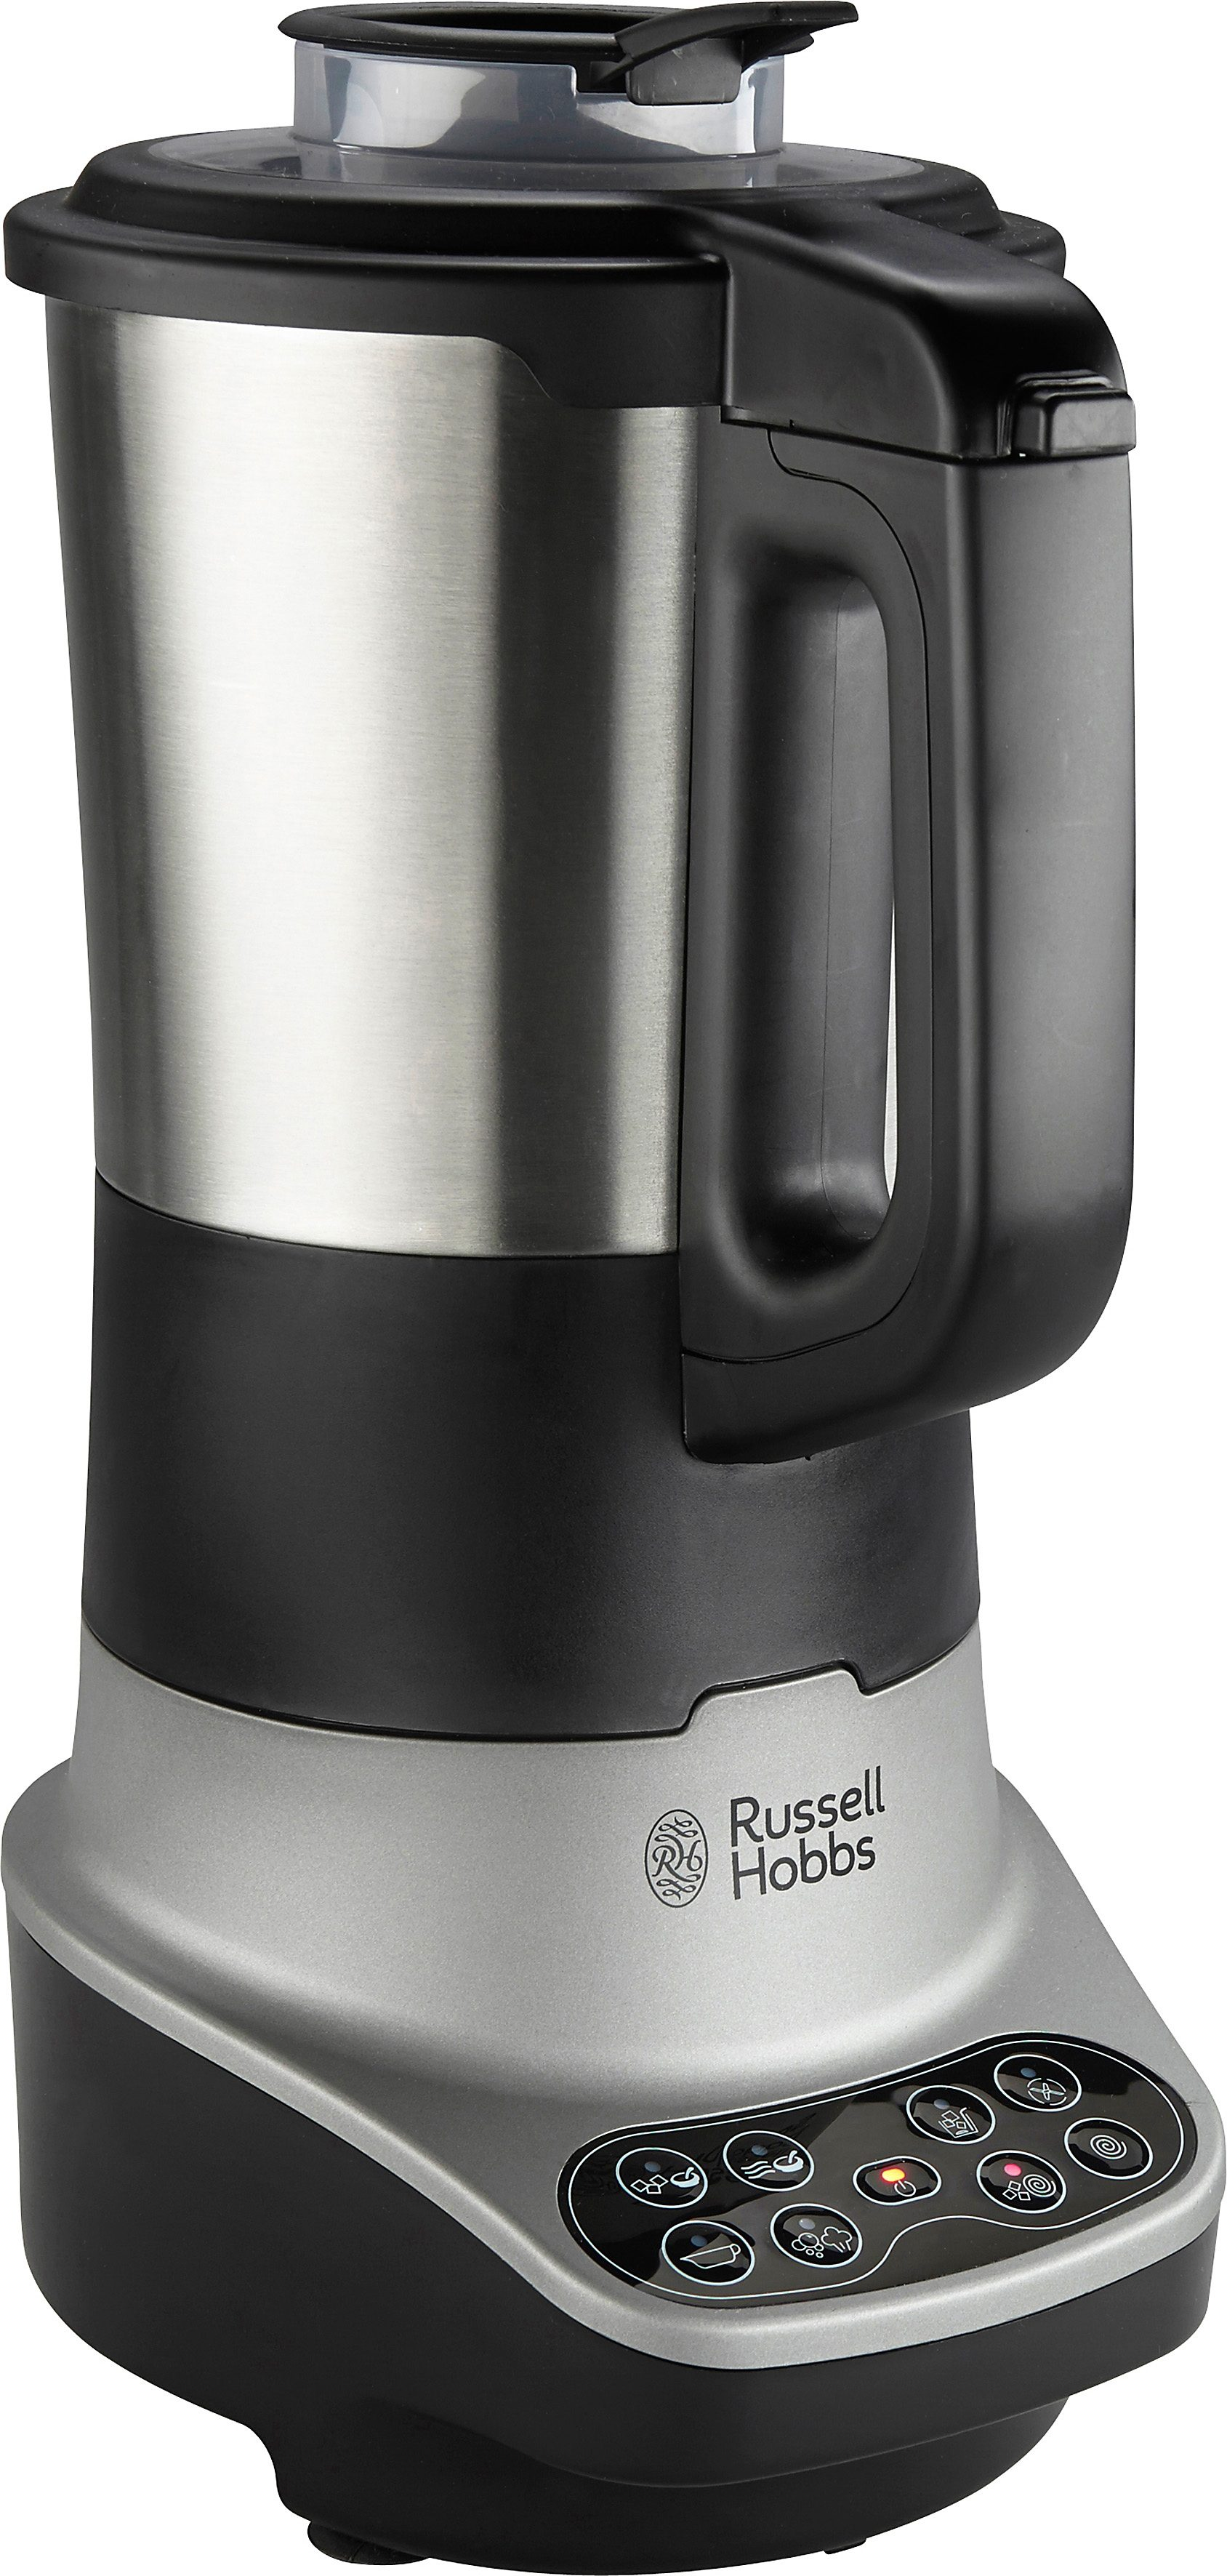 Standmixer mit Kochfunktion 21480-56, 400 Watt, 8 Programme